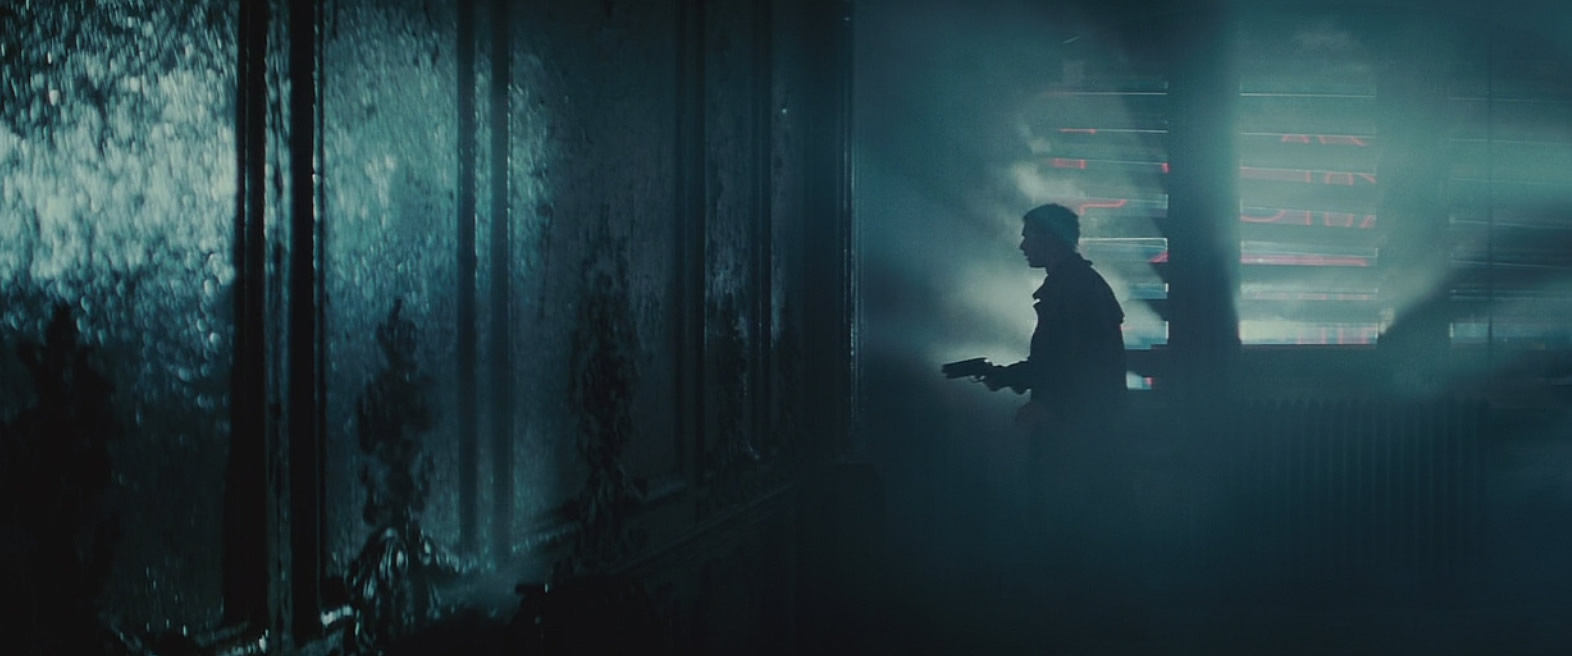 Бегущий по лезвию (Blade Runner) 1982